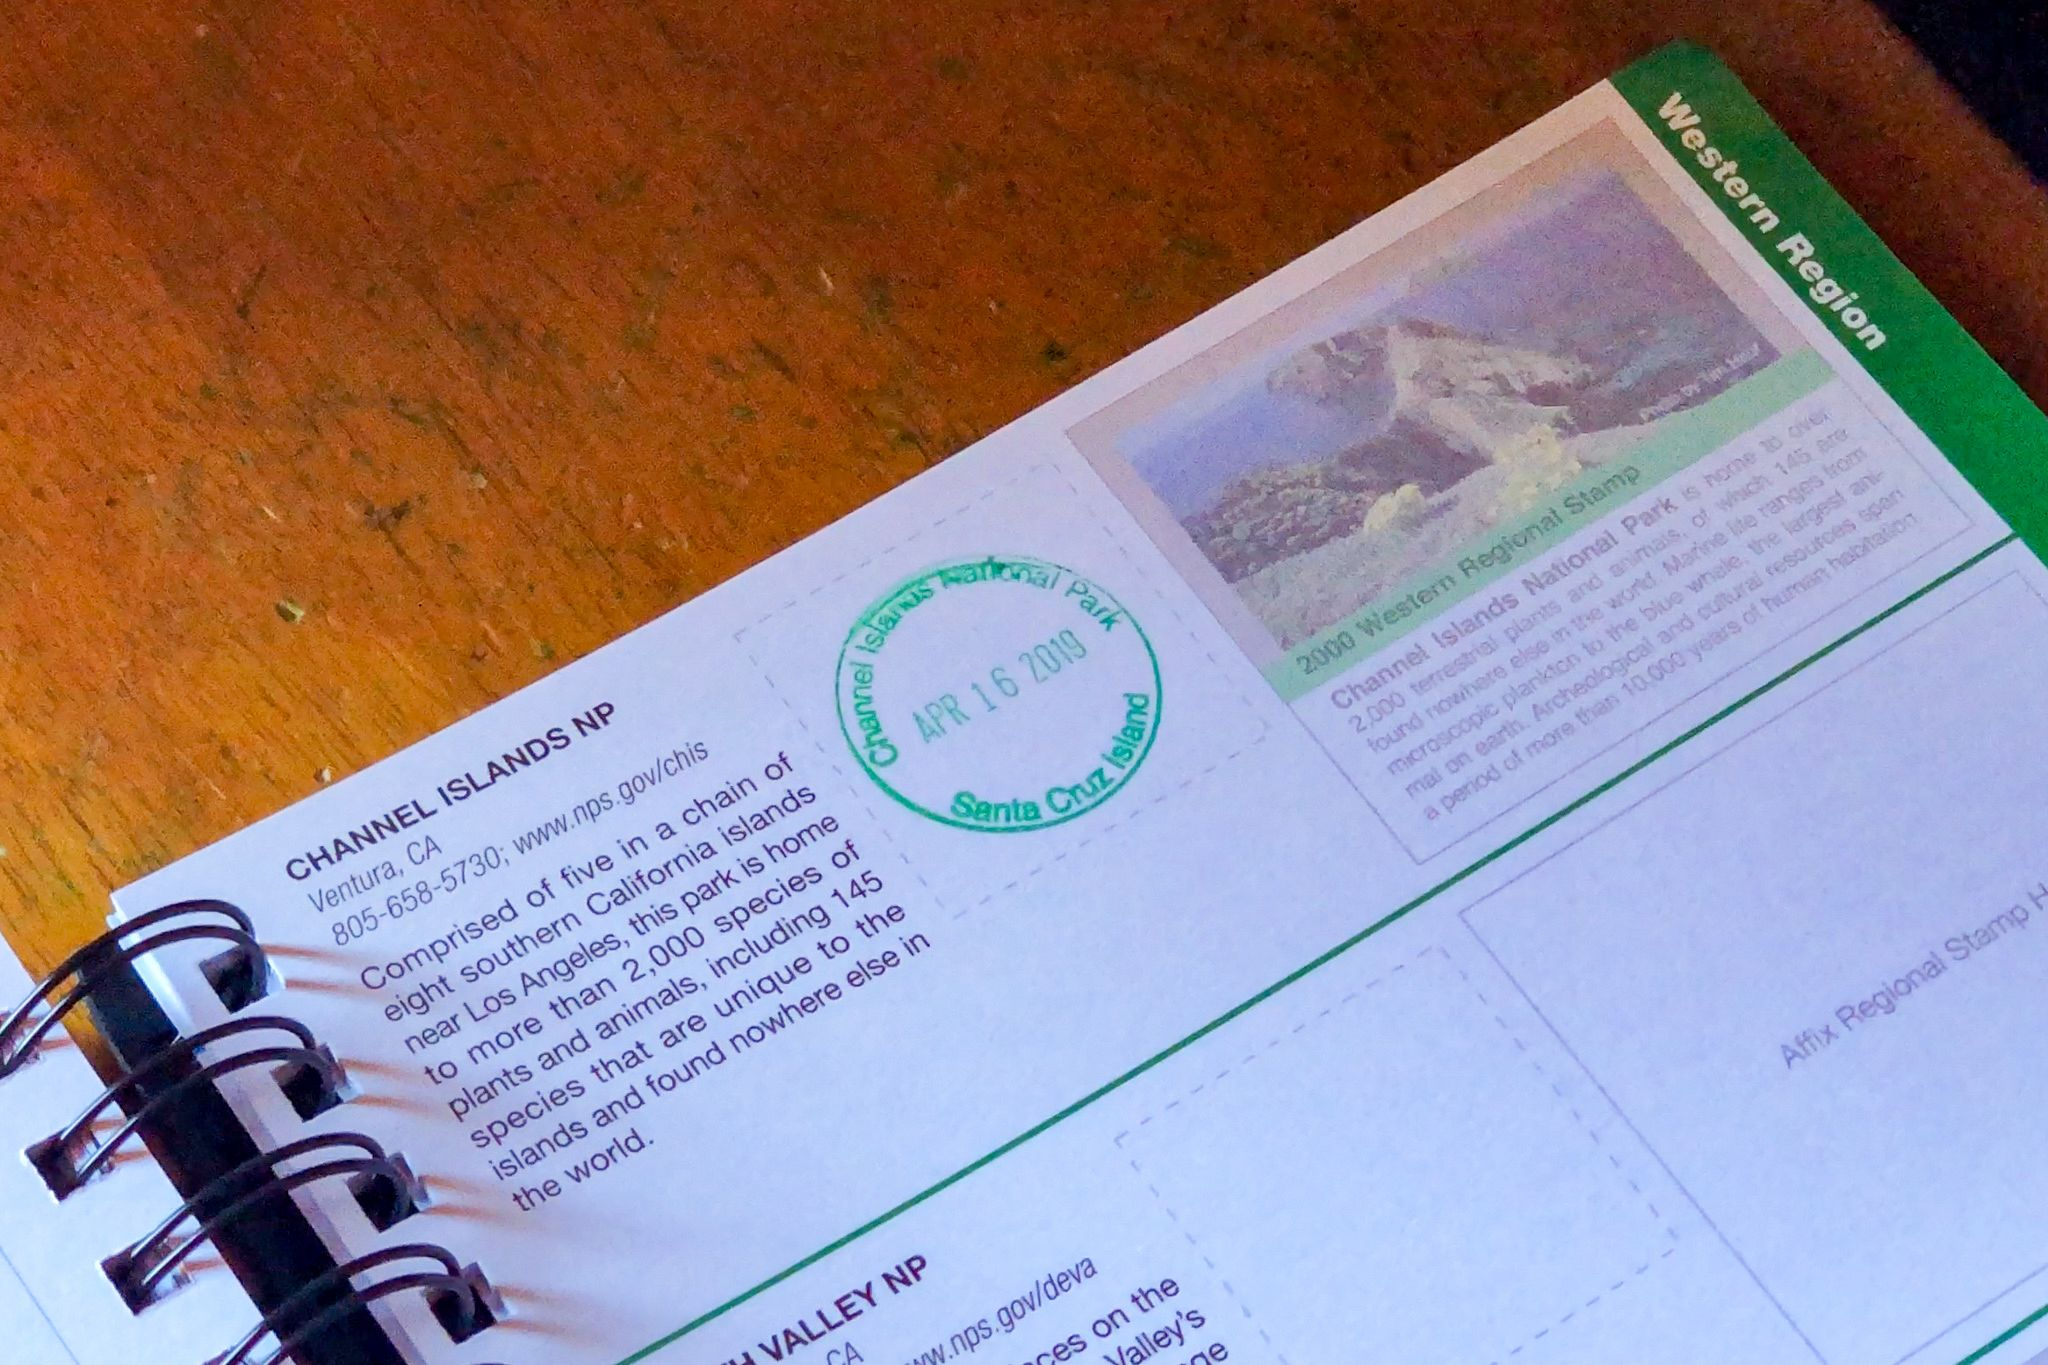 Channel Islands National Park Passport Stamp